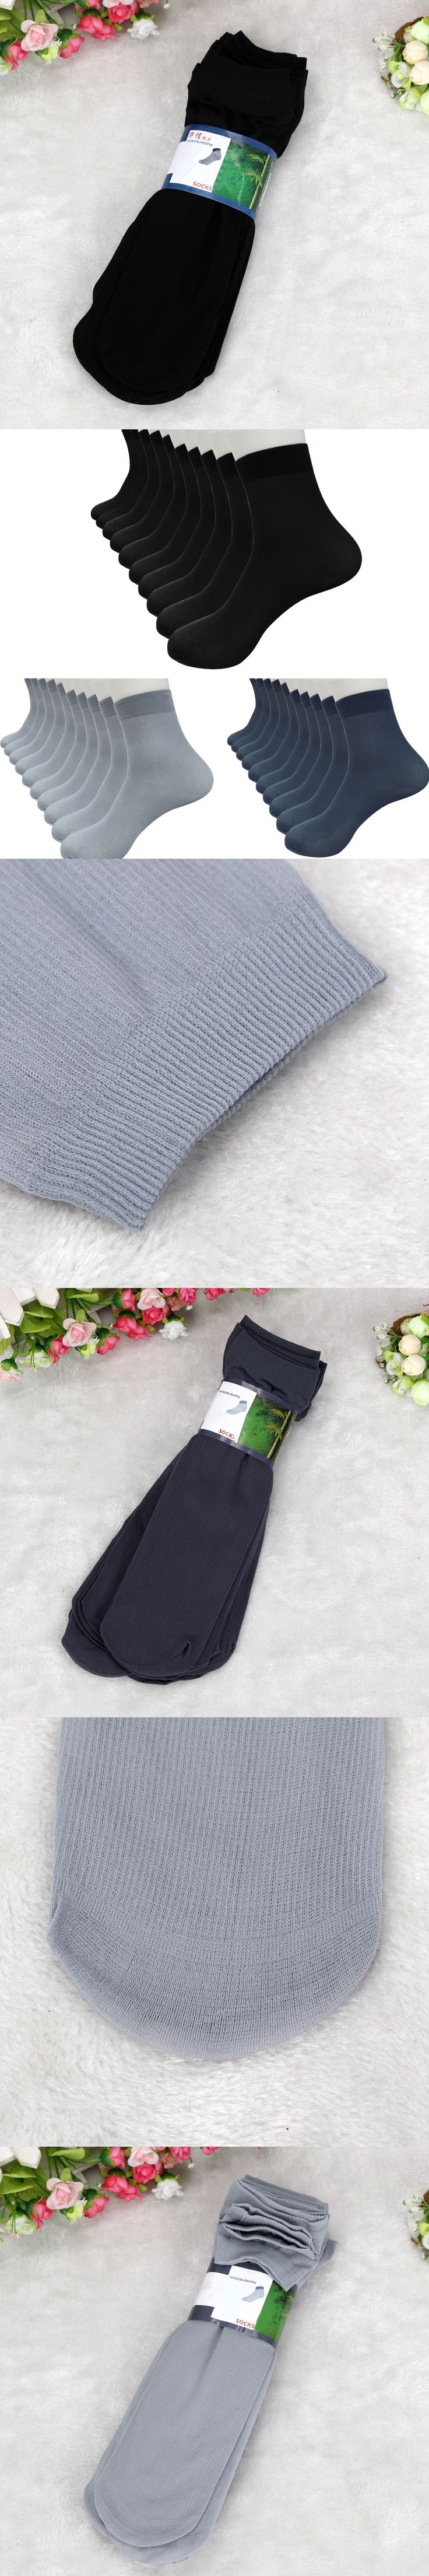 Big Sale 10 Pairs Bamboo Fiber Ultra-thin Elastic Silky Short Silk Stockings Men Socks